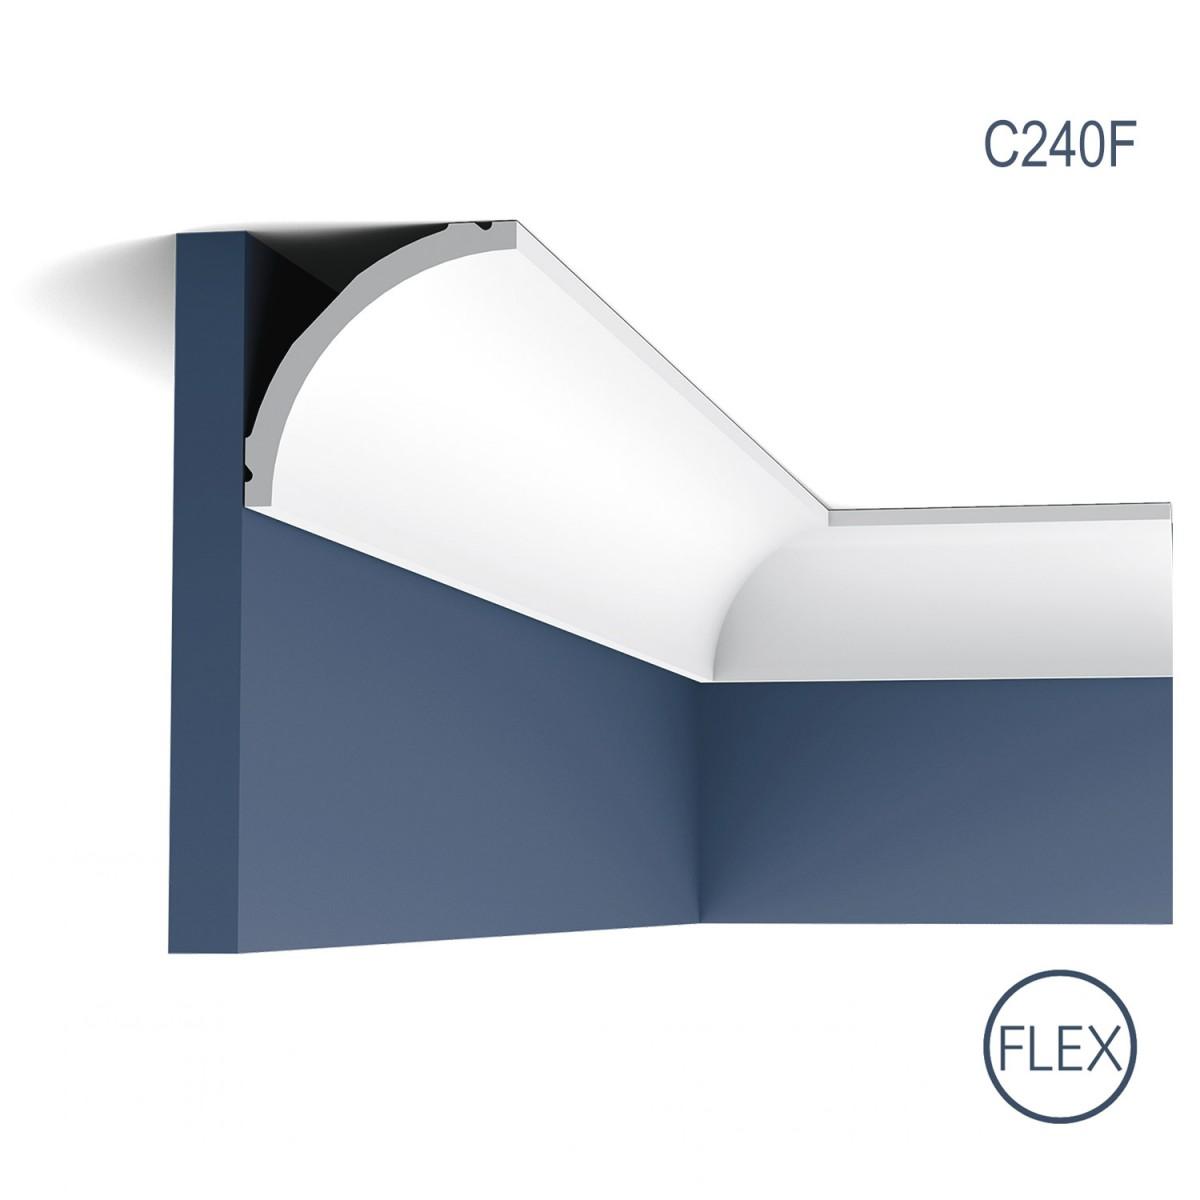 Cornisa Flex Luxxus C240F, Dimensiuni: 200 X 8 X 8 cm, Orac Decor